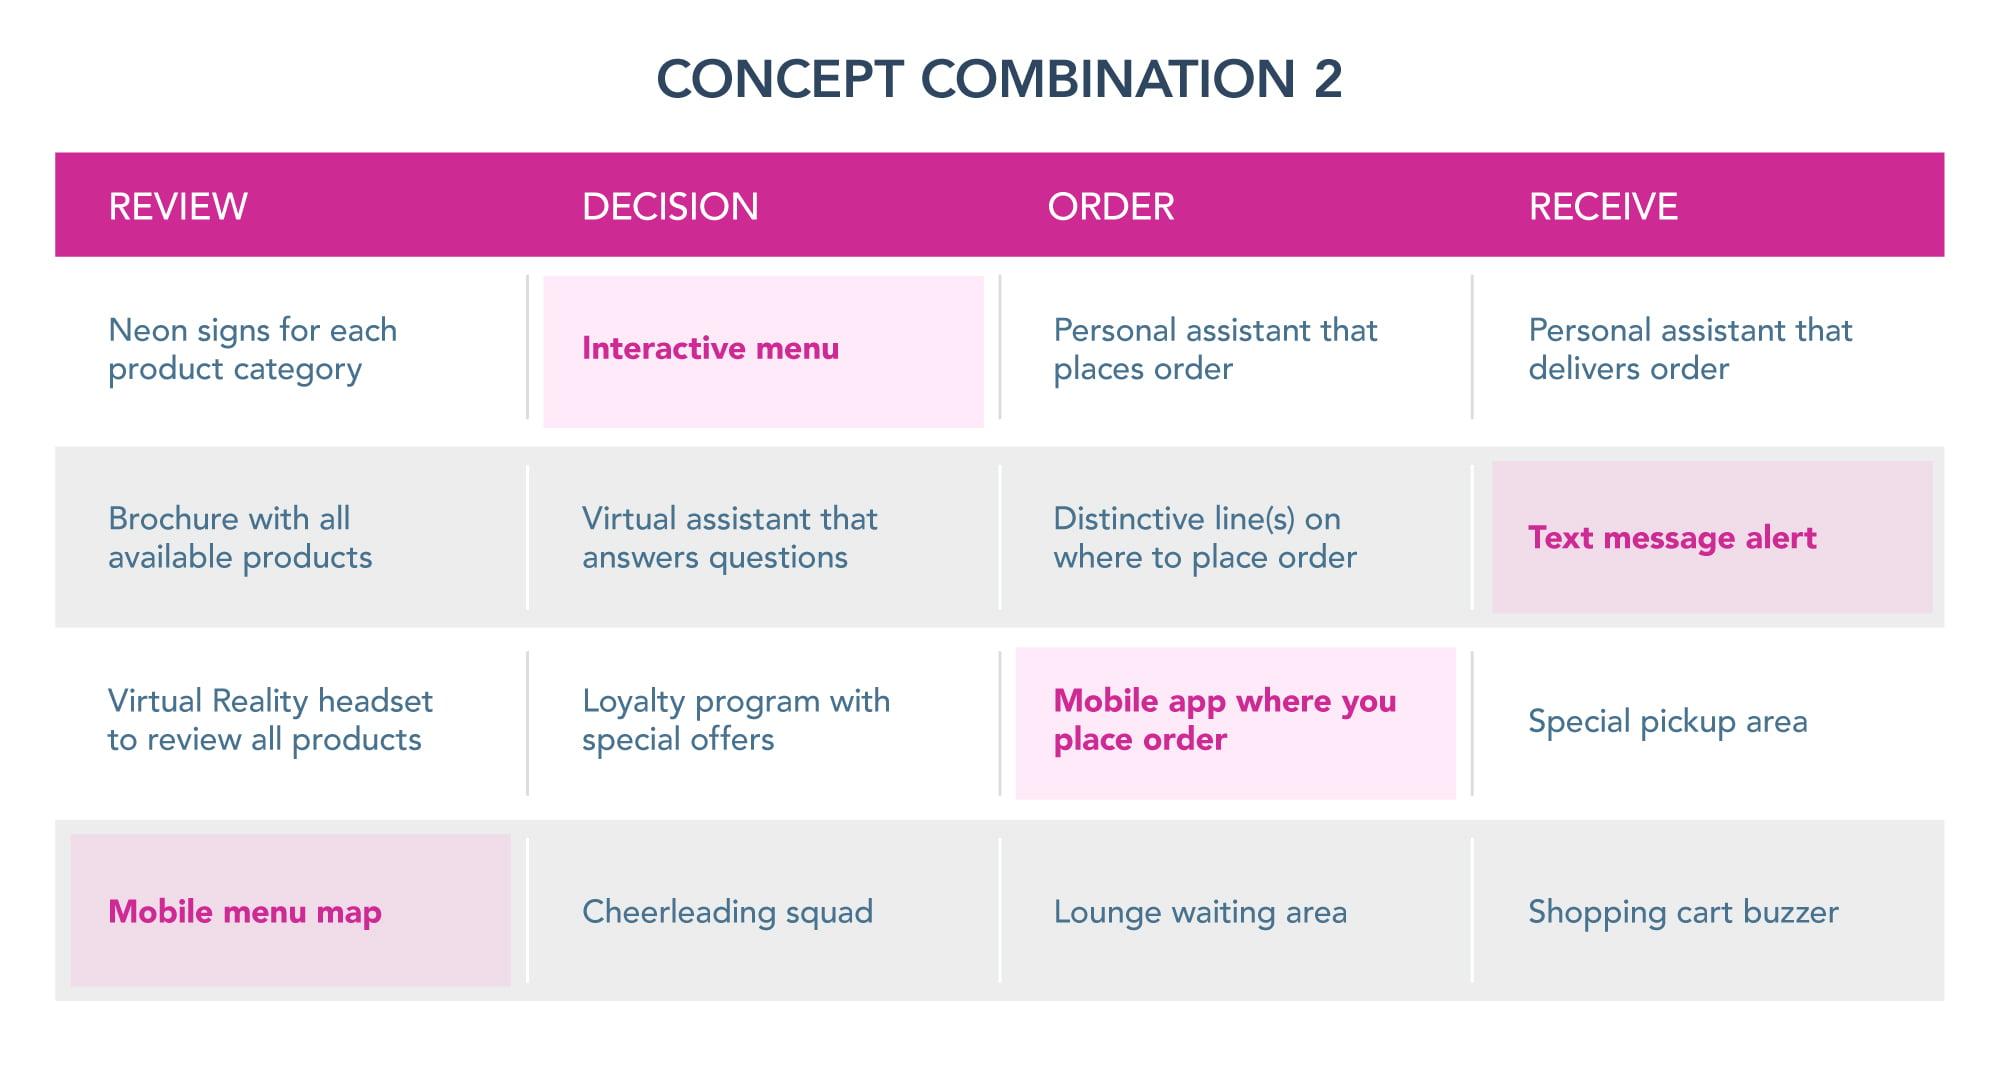 Concept Combination 2